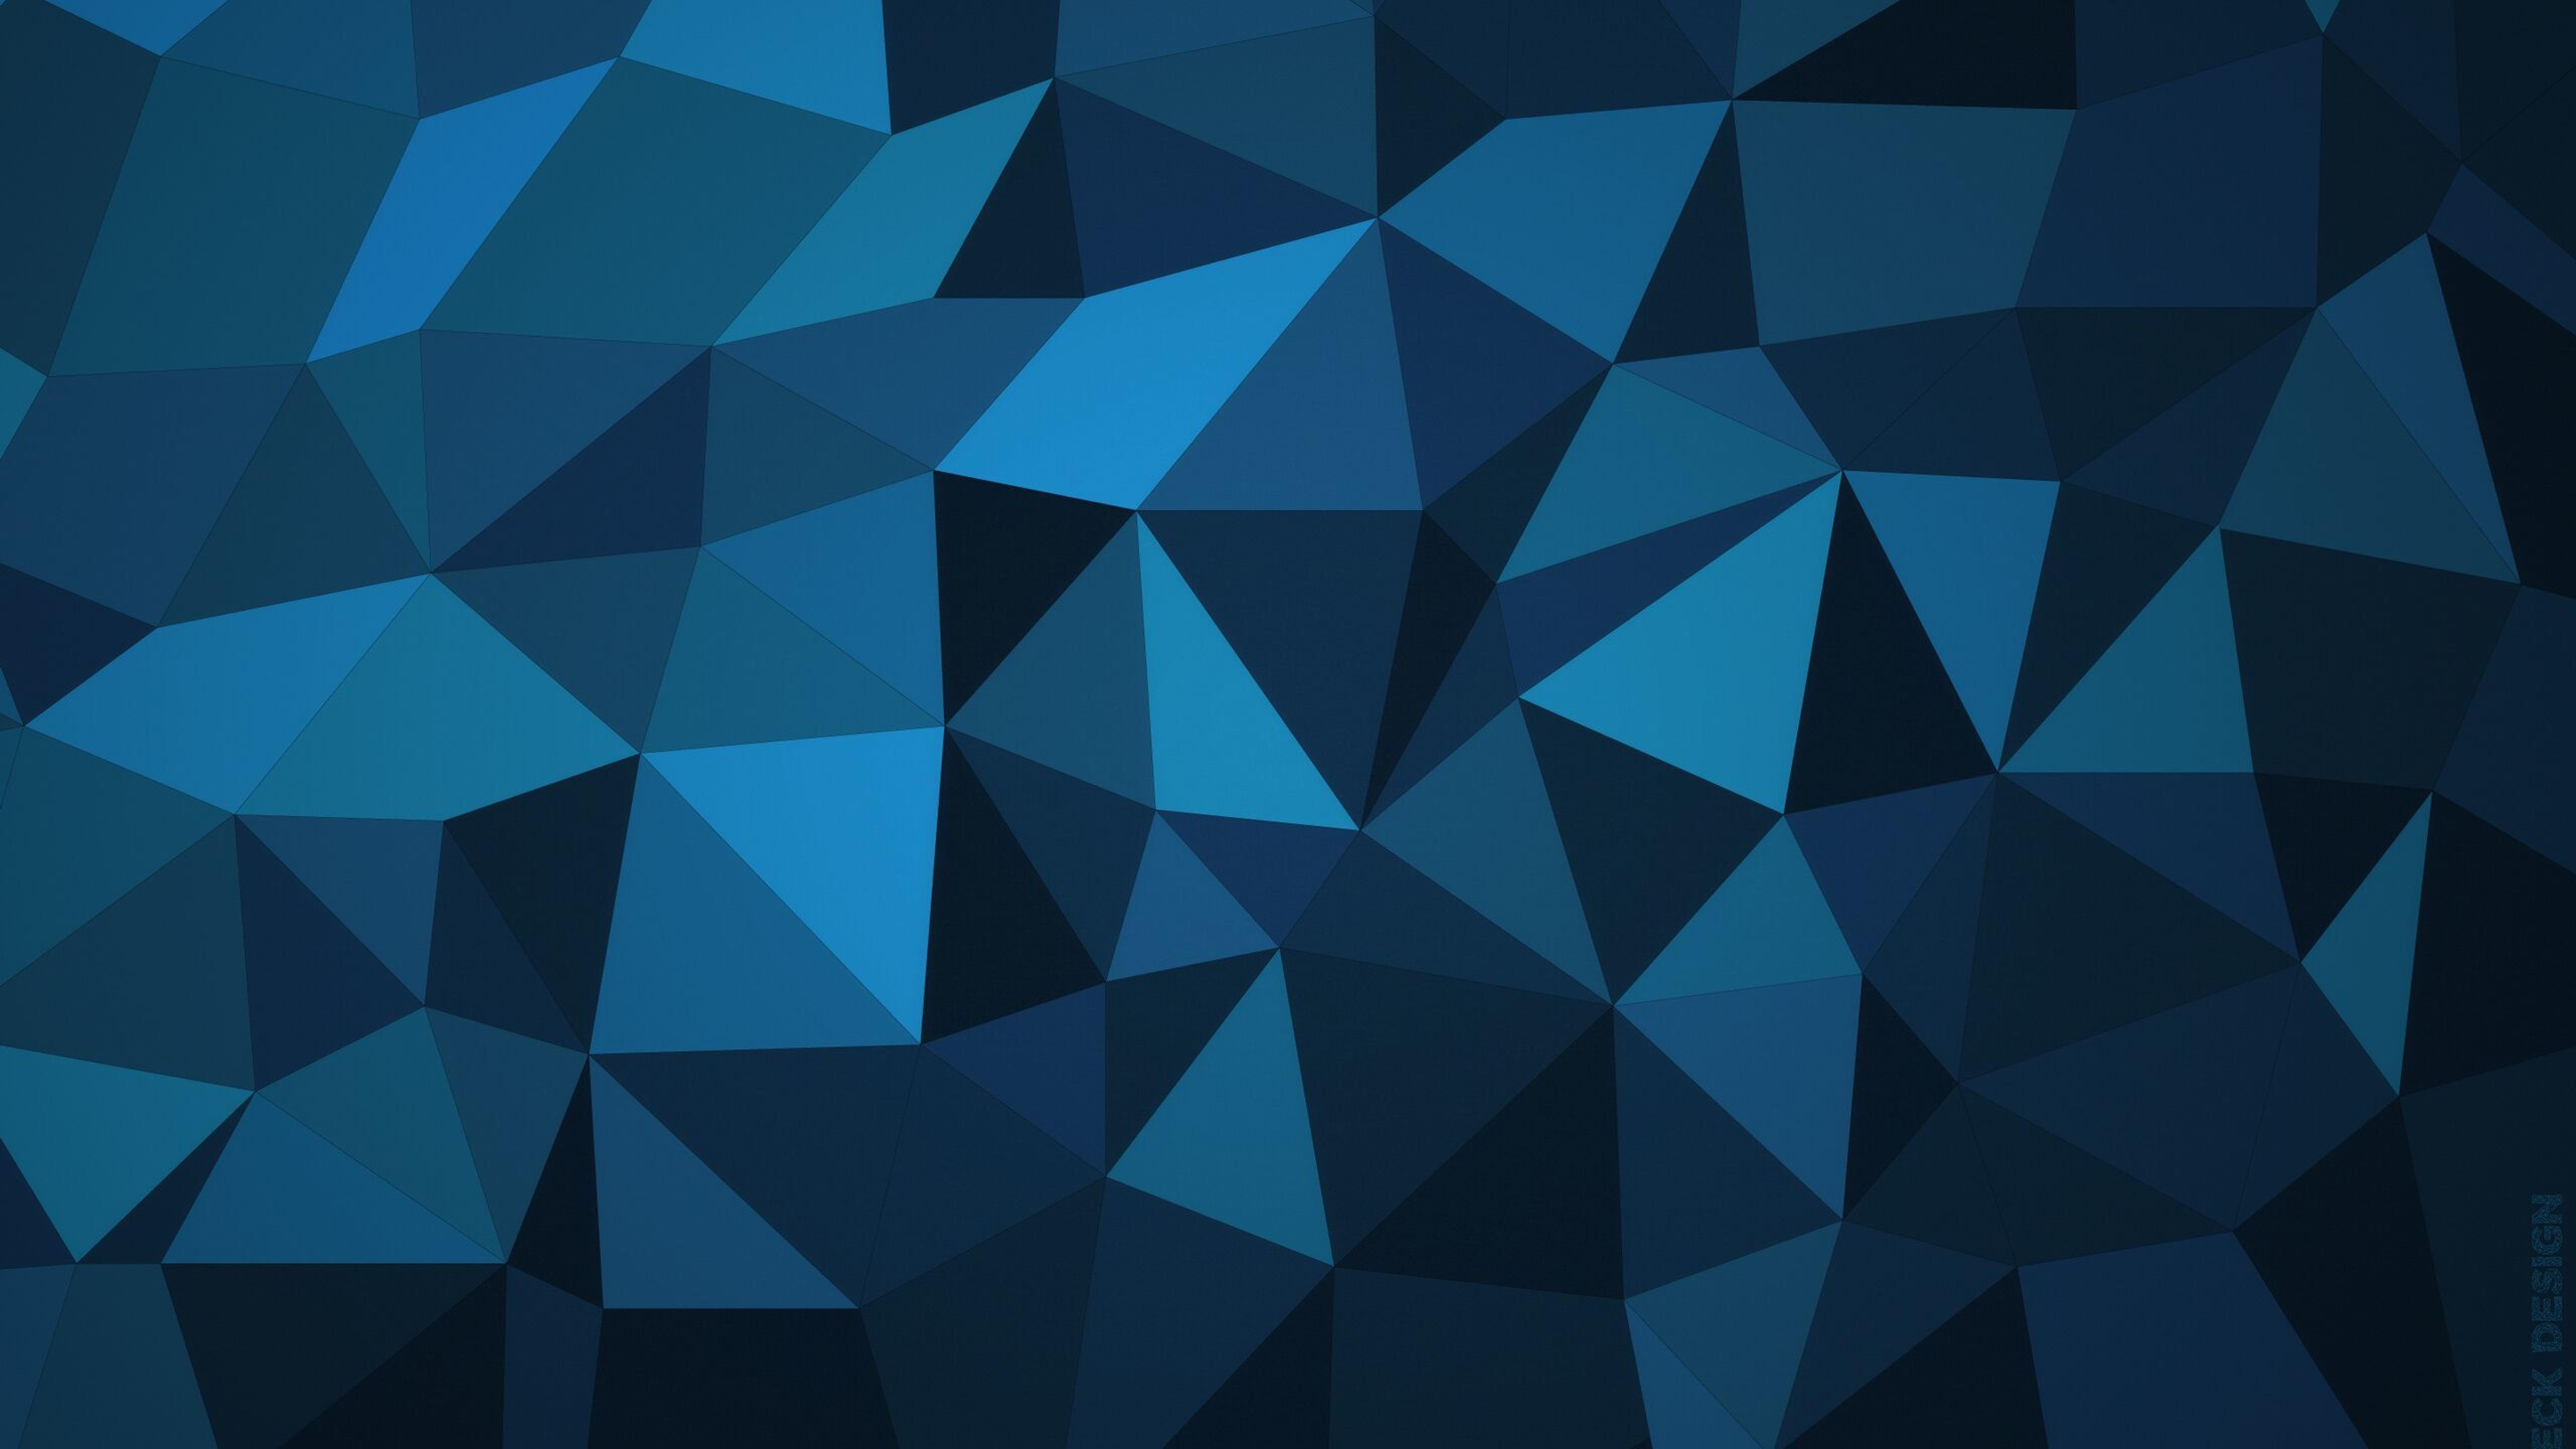 Download Galaxy Note 5 Galaxy S6 Edge Full Hd Stock: Low Poly Blue, Full HD 2K Wallpaper